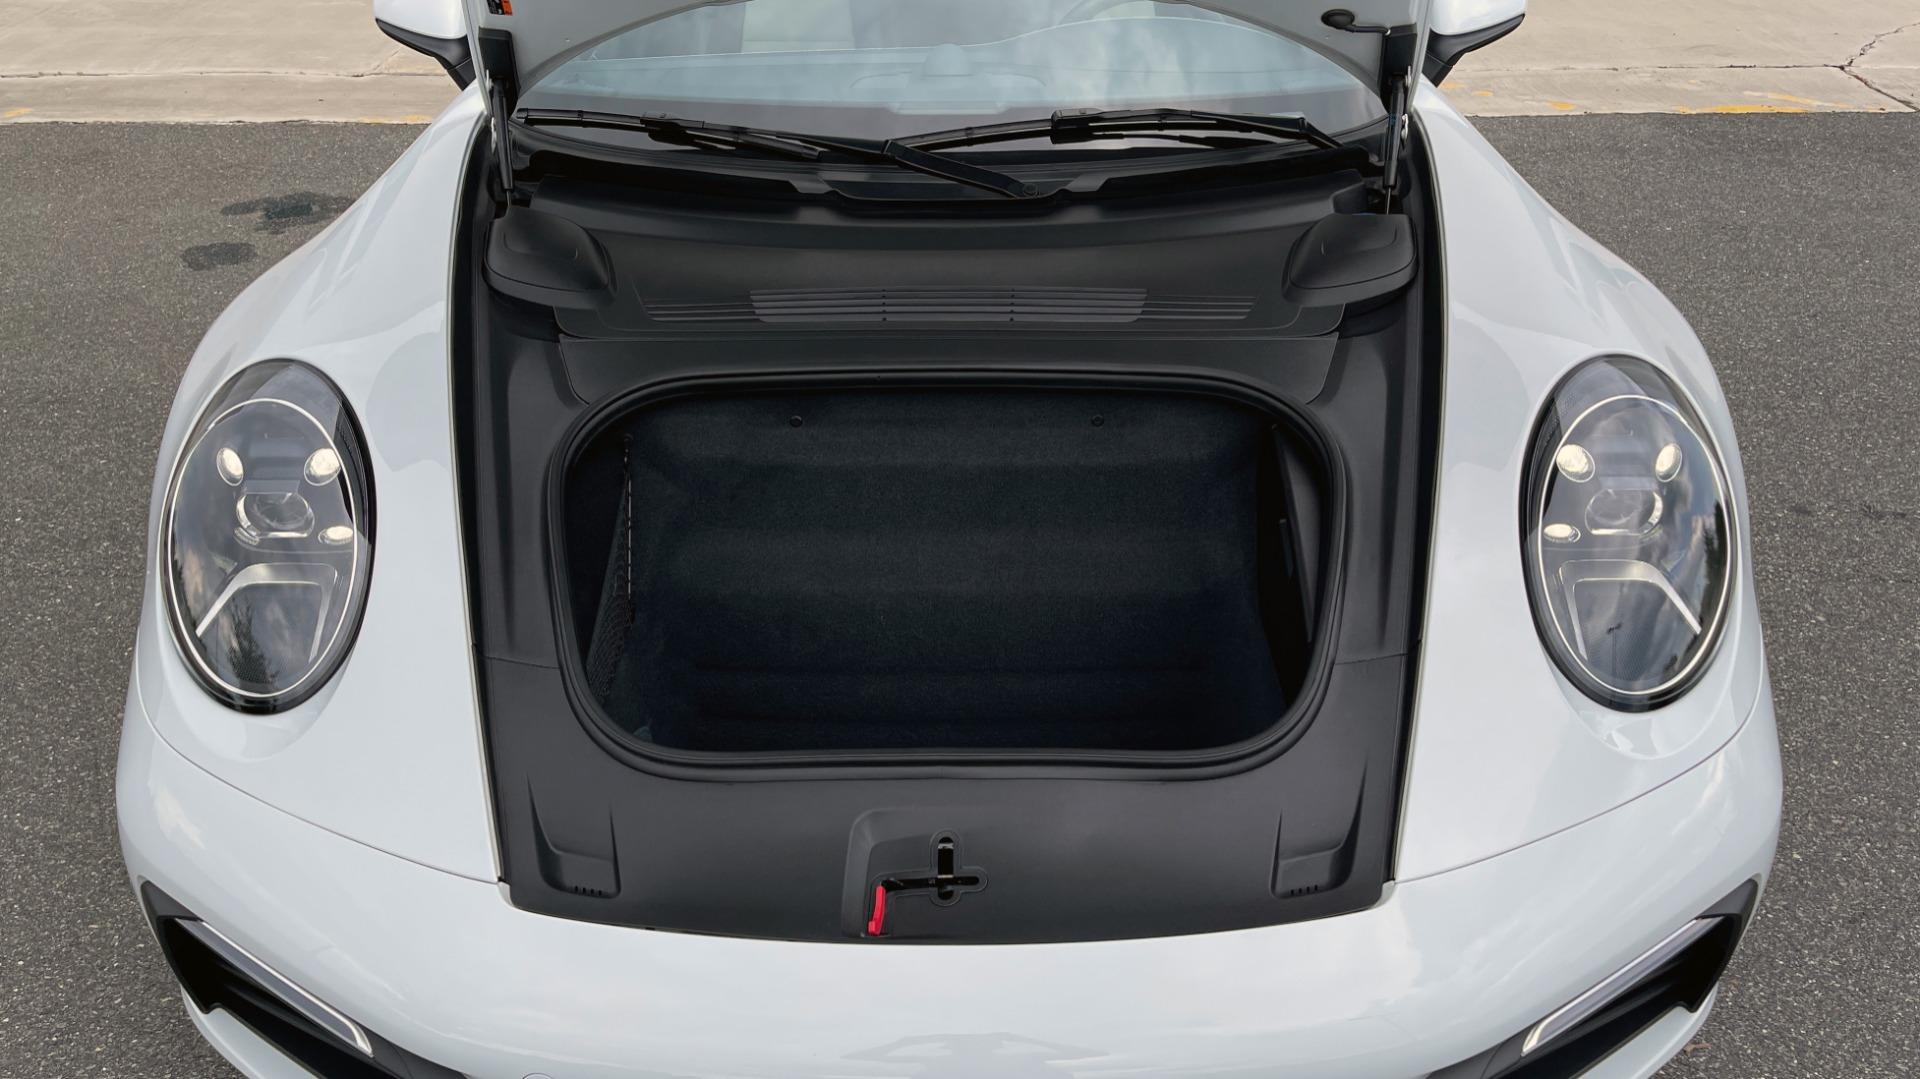 Used 2020 Porsche 911 CARRERA 4S CABRIOLET PREMIUM SPORT PKG / NAV / BOSE / LIGHT DESIGN PKG for sale $167,595 at Formula Imports in Charlotte NC 28227 16